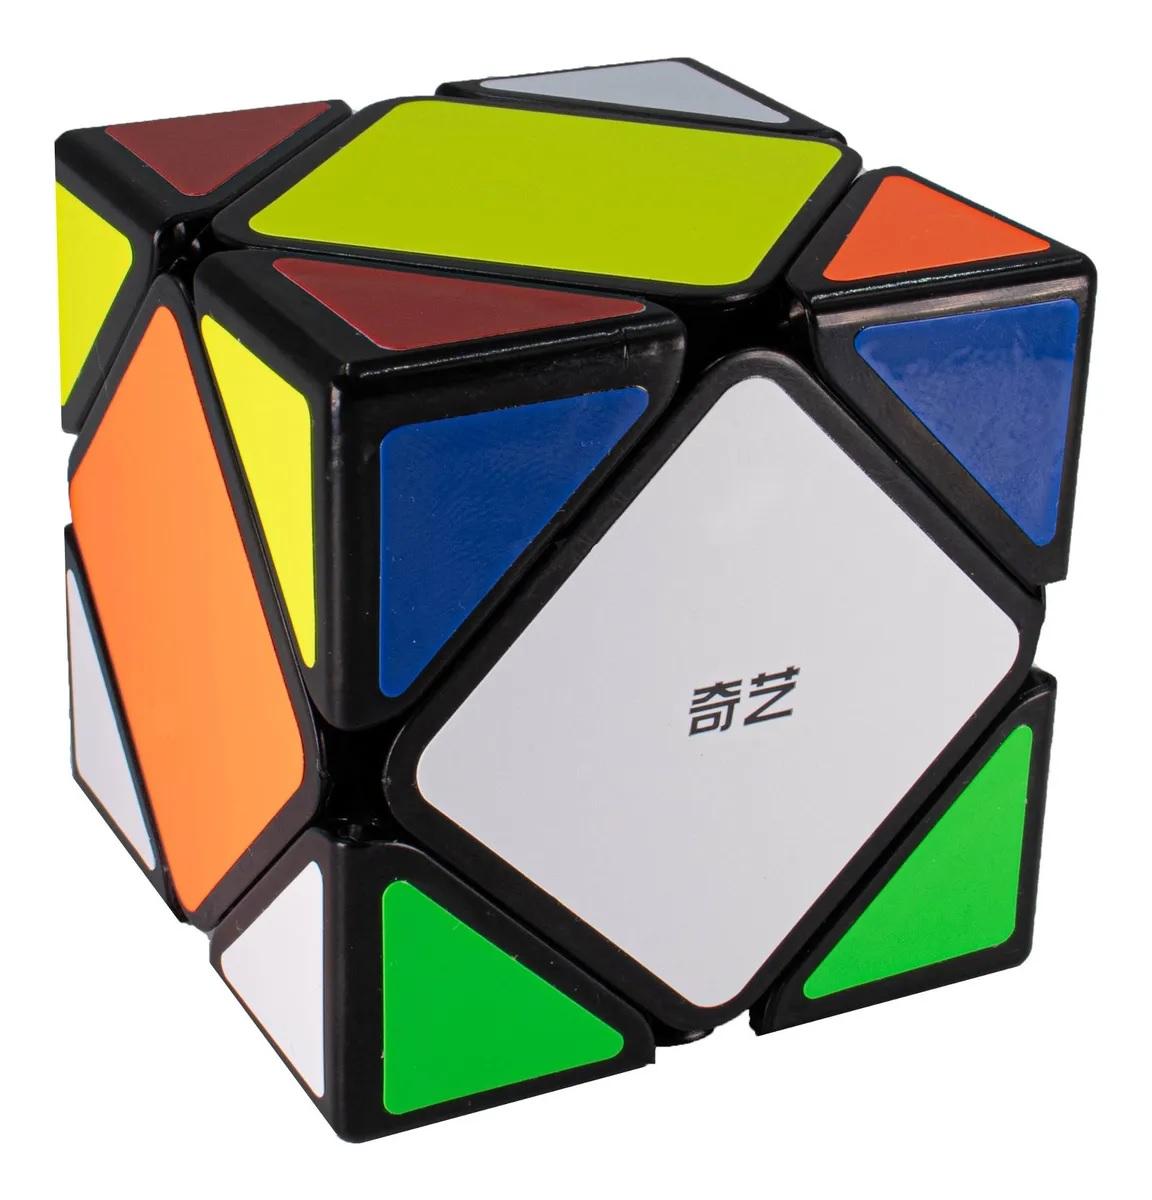 Cubo Mágico Profissional Skewb Qiyi QiCheng Preto - Qiyi-Mfg